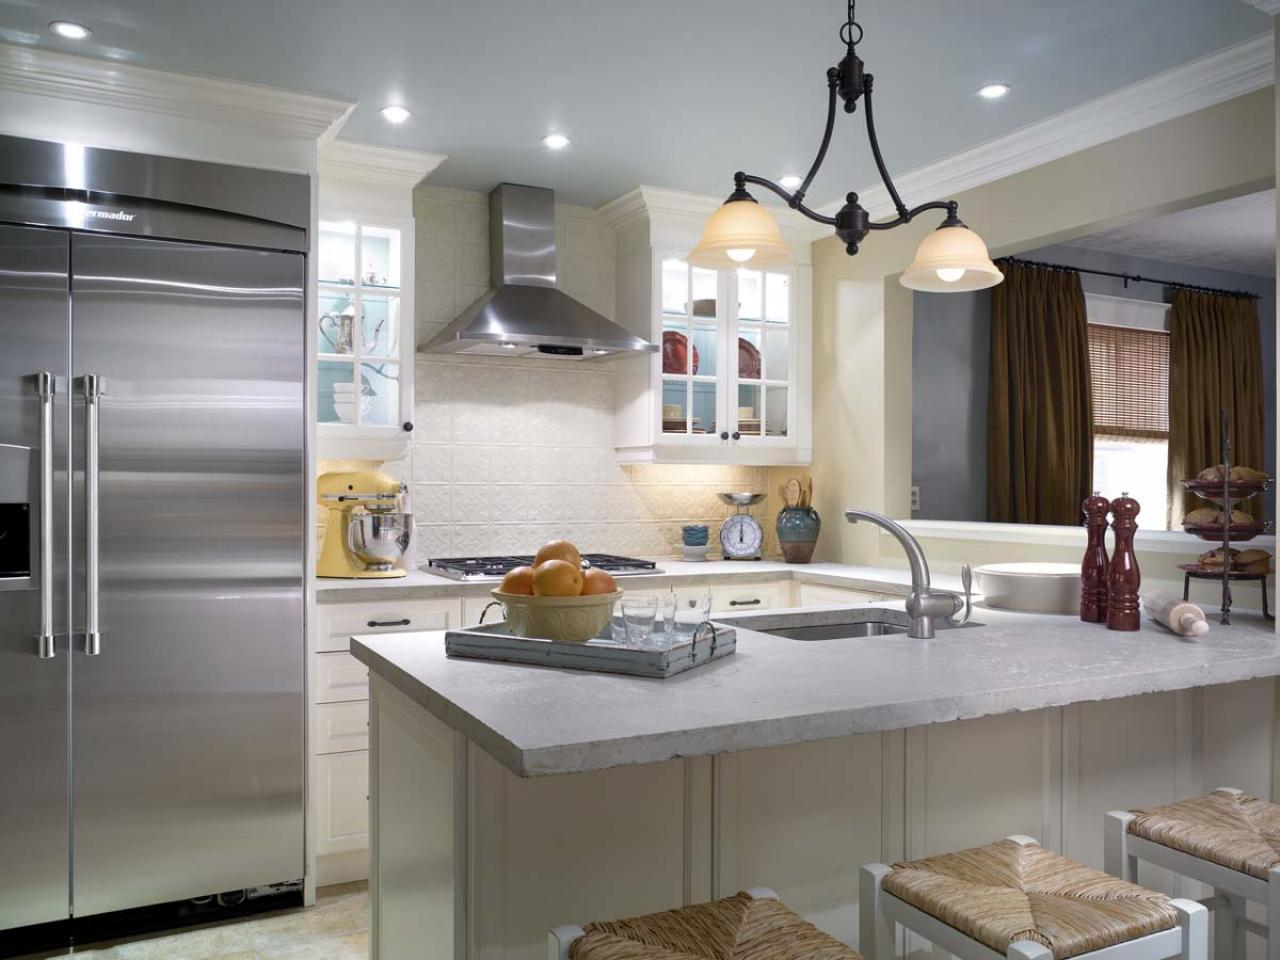 candice olson kitchen backsplash ideas photo - 1